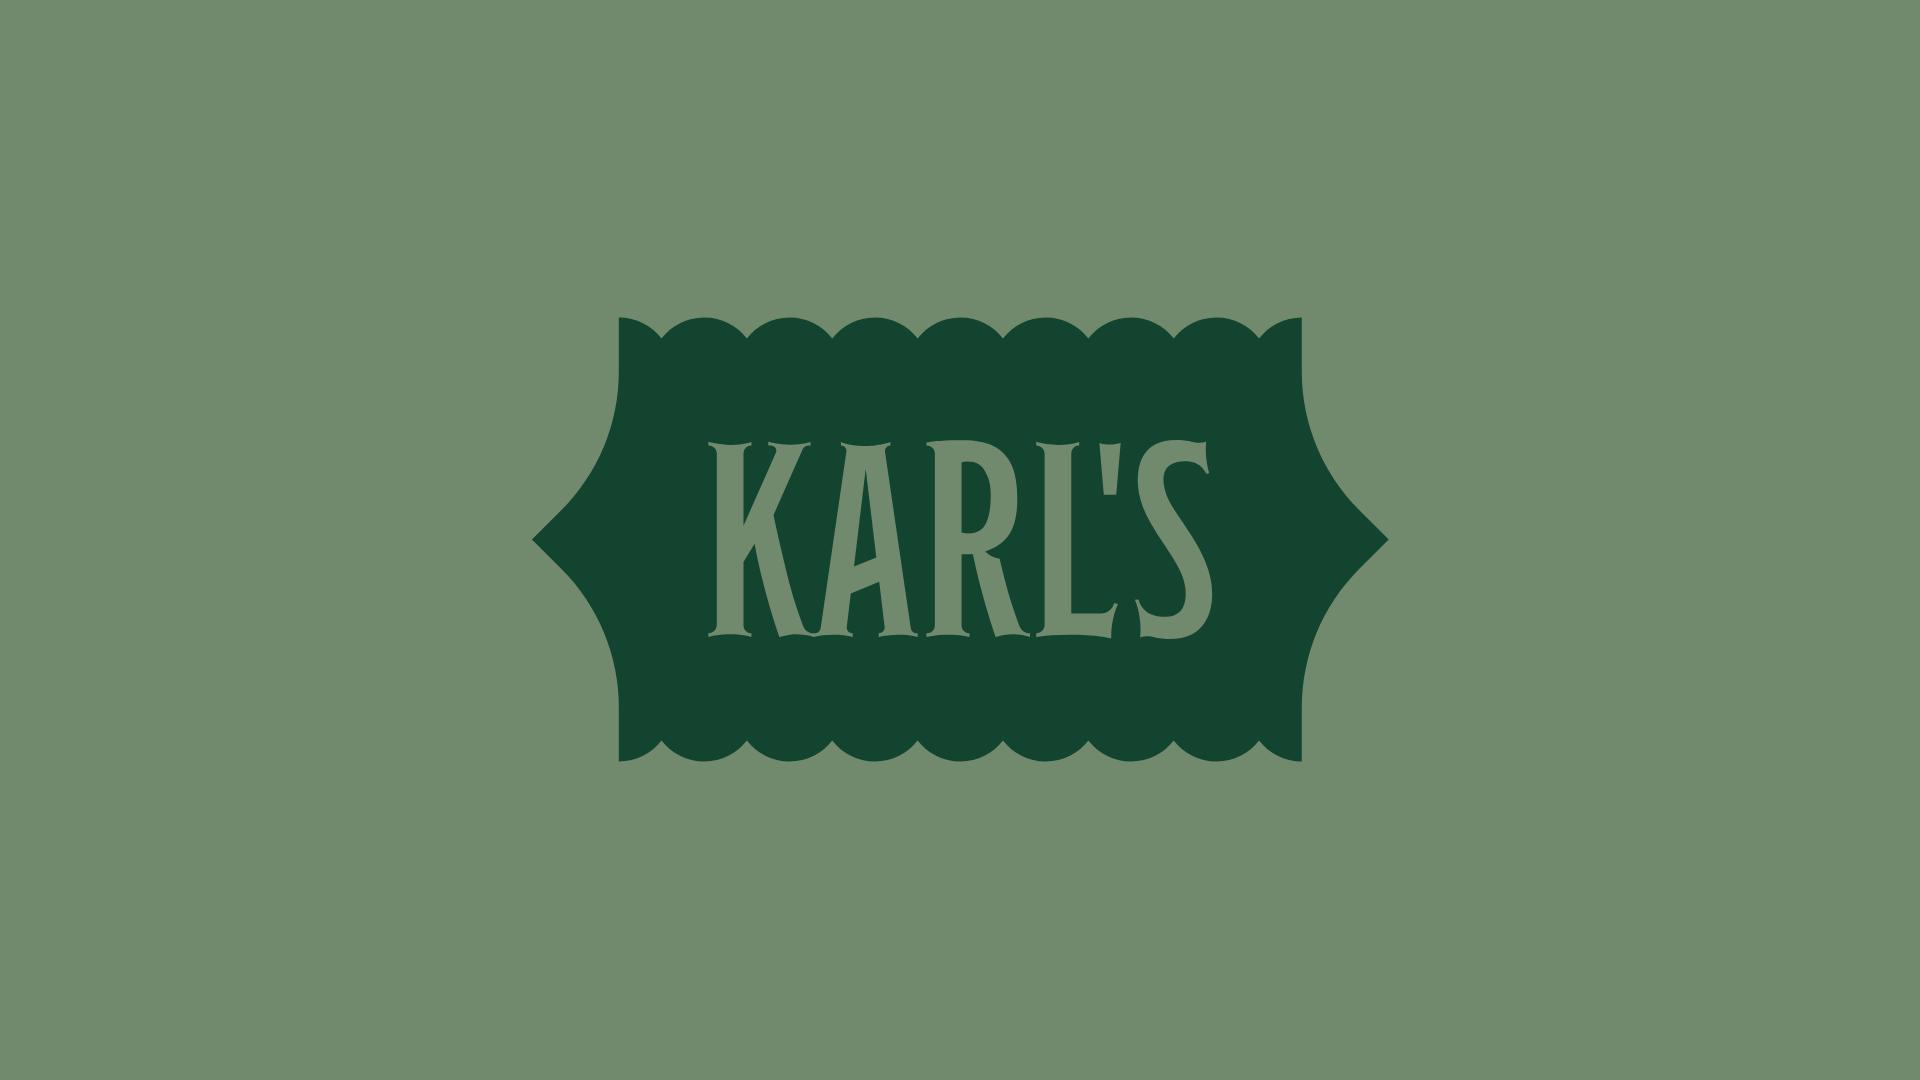 Karl's  Brand Identity, Typography, Website  In-Progress